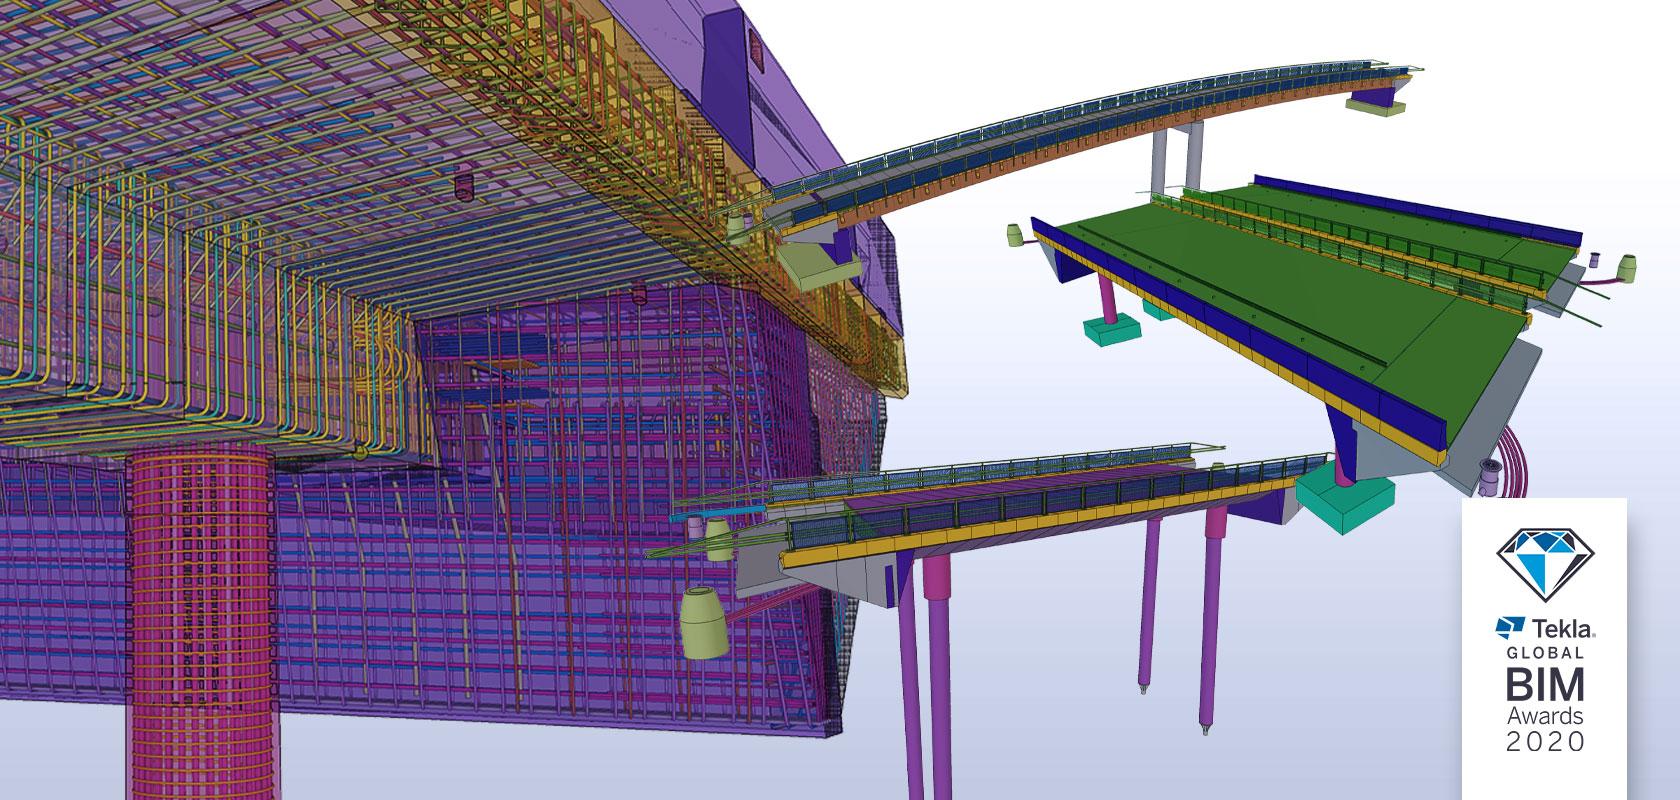 Tekla Structures BIM bridges of the Highway 4 Kirri-Tikkakoski project